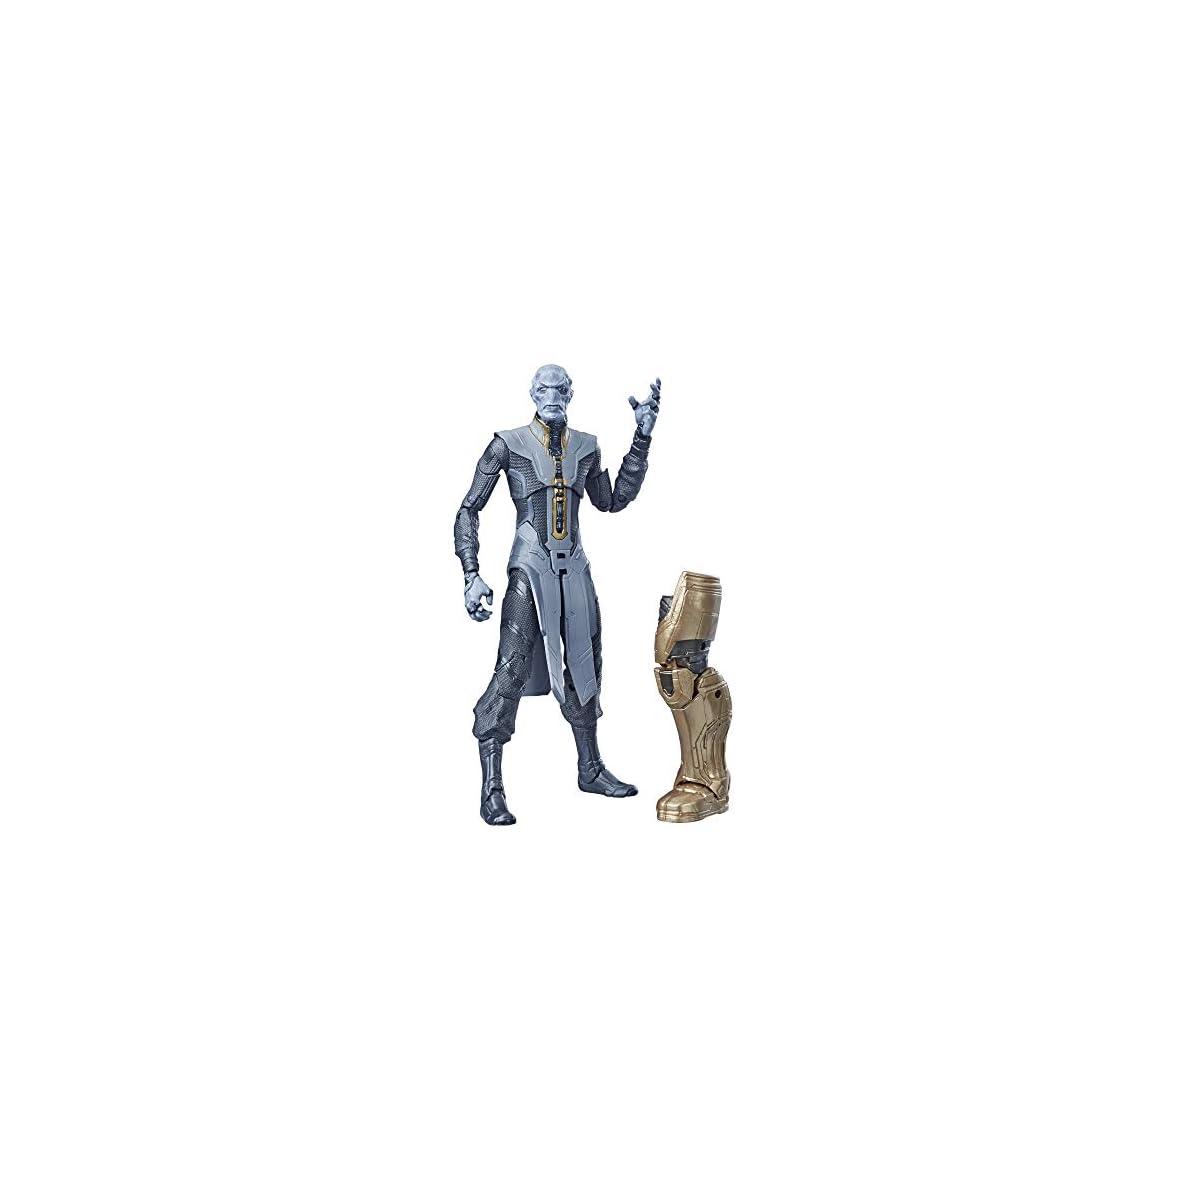 "SaleProductsOffer - No.1 Best Online Store 41ndBIQgakL Avengers Hasbro Marvel Legends Series Endgame 6"" Ebony Maw Marvel Cinematic Universe Collectible Fan Figure"